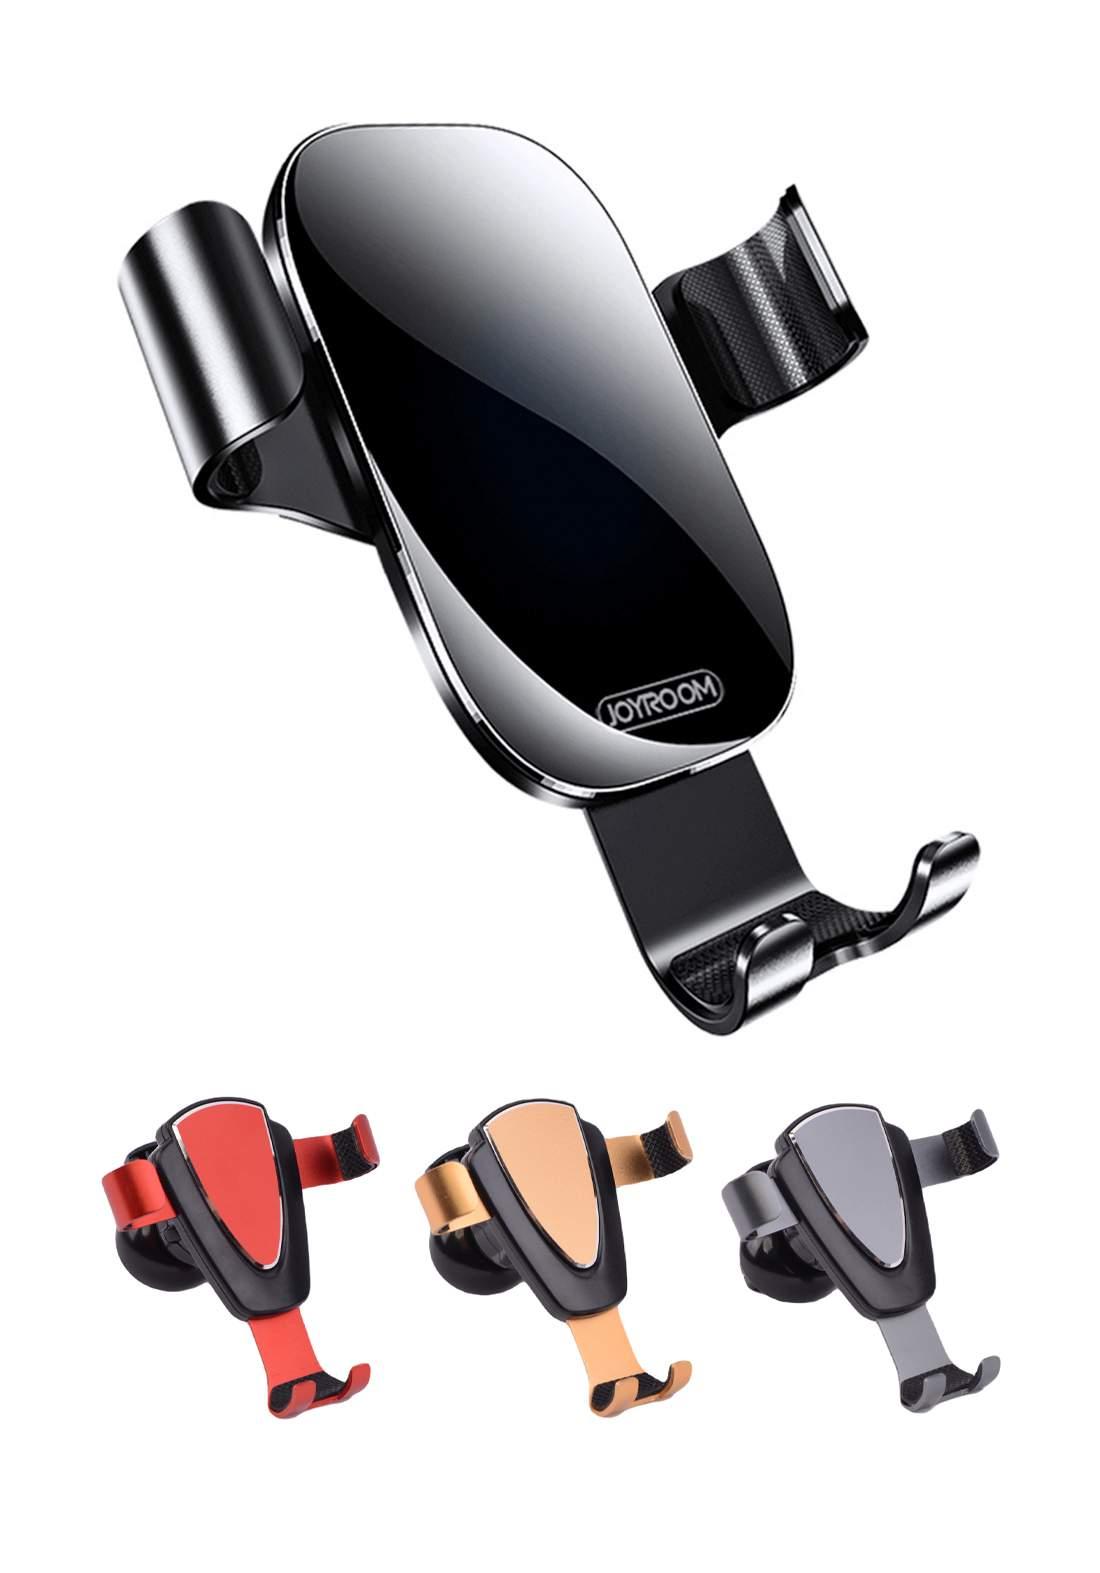 Phone Holder For Dashboard Car حامل موبايل للسيارة